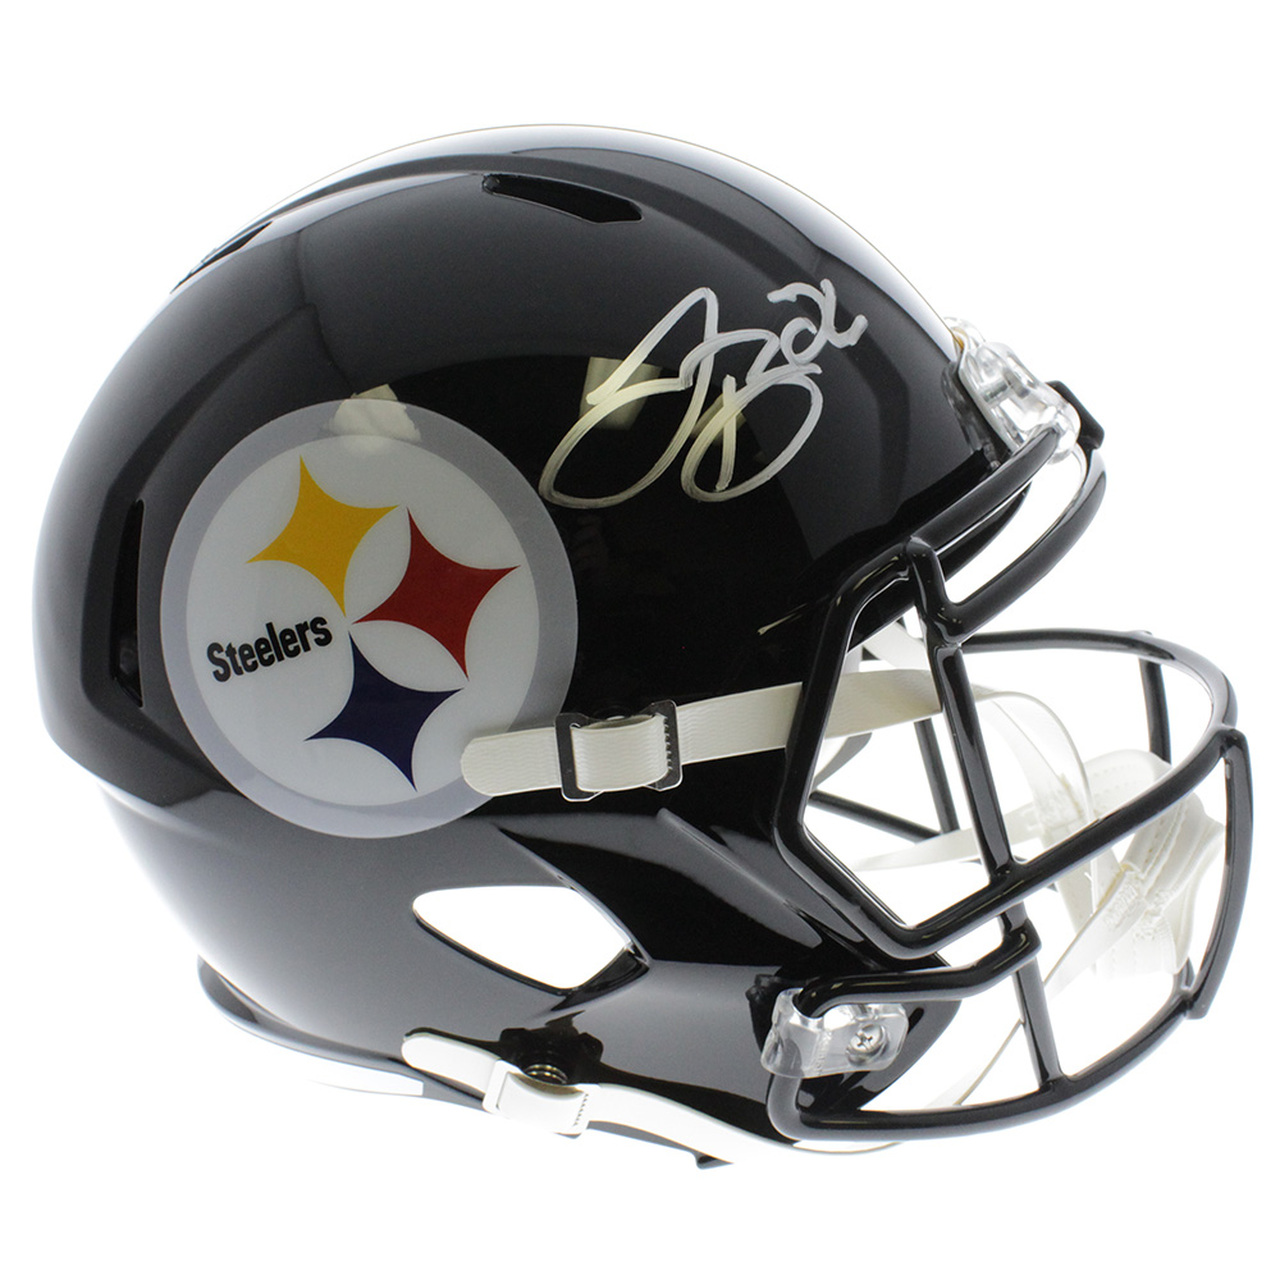 2cc5c6afcbd Le Veon Bell Pittsburgh Steelers Speed Replica Helmet Autographed ...